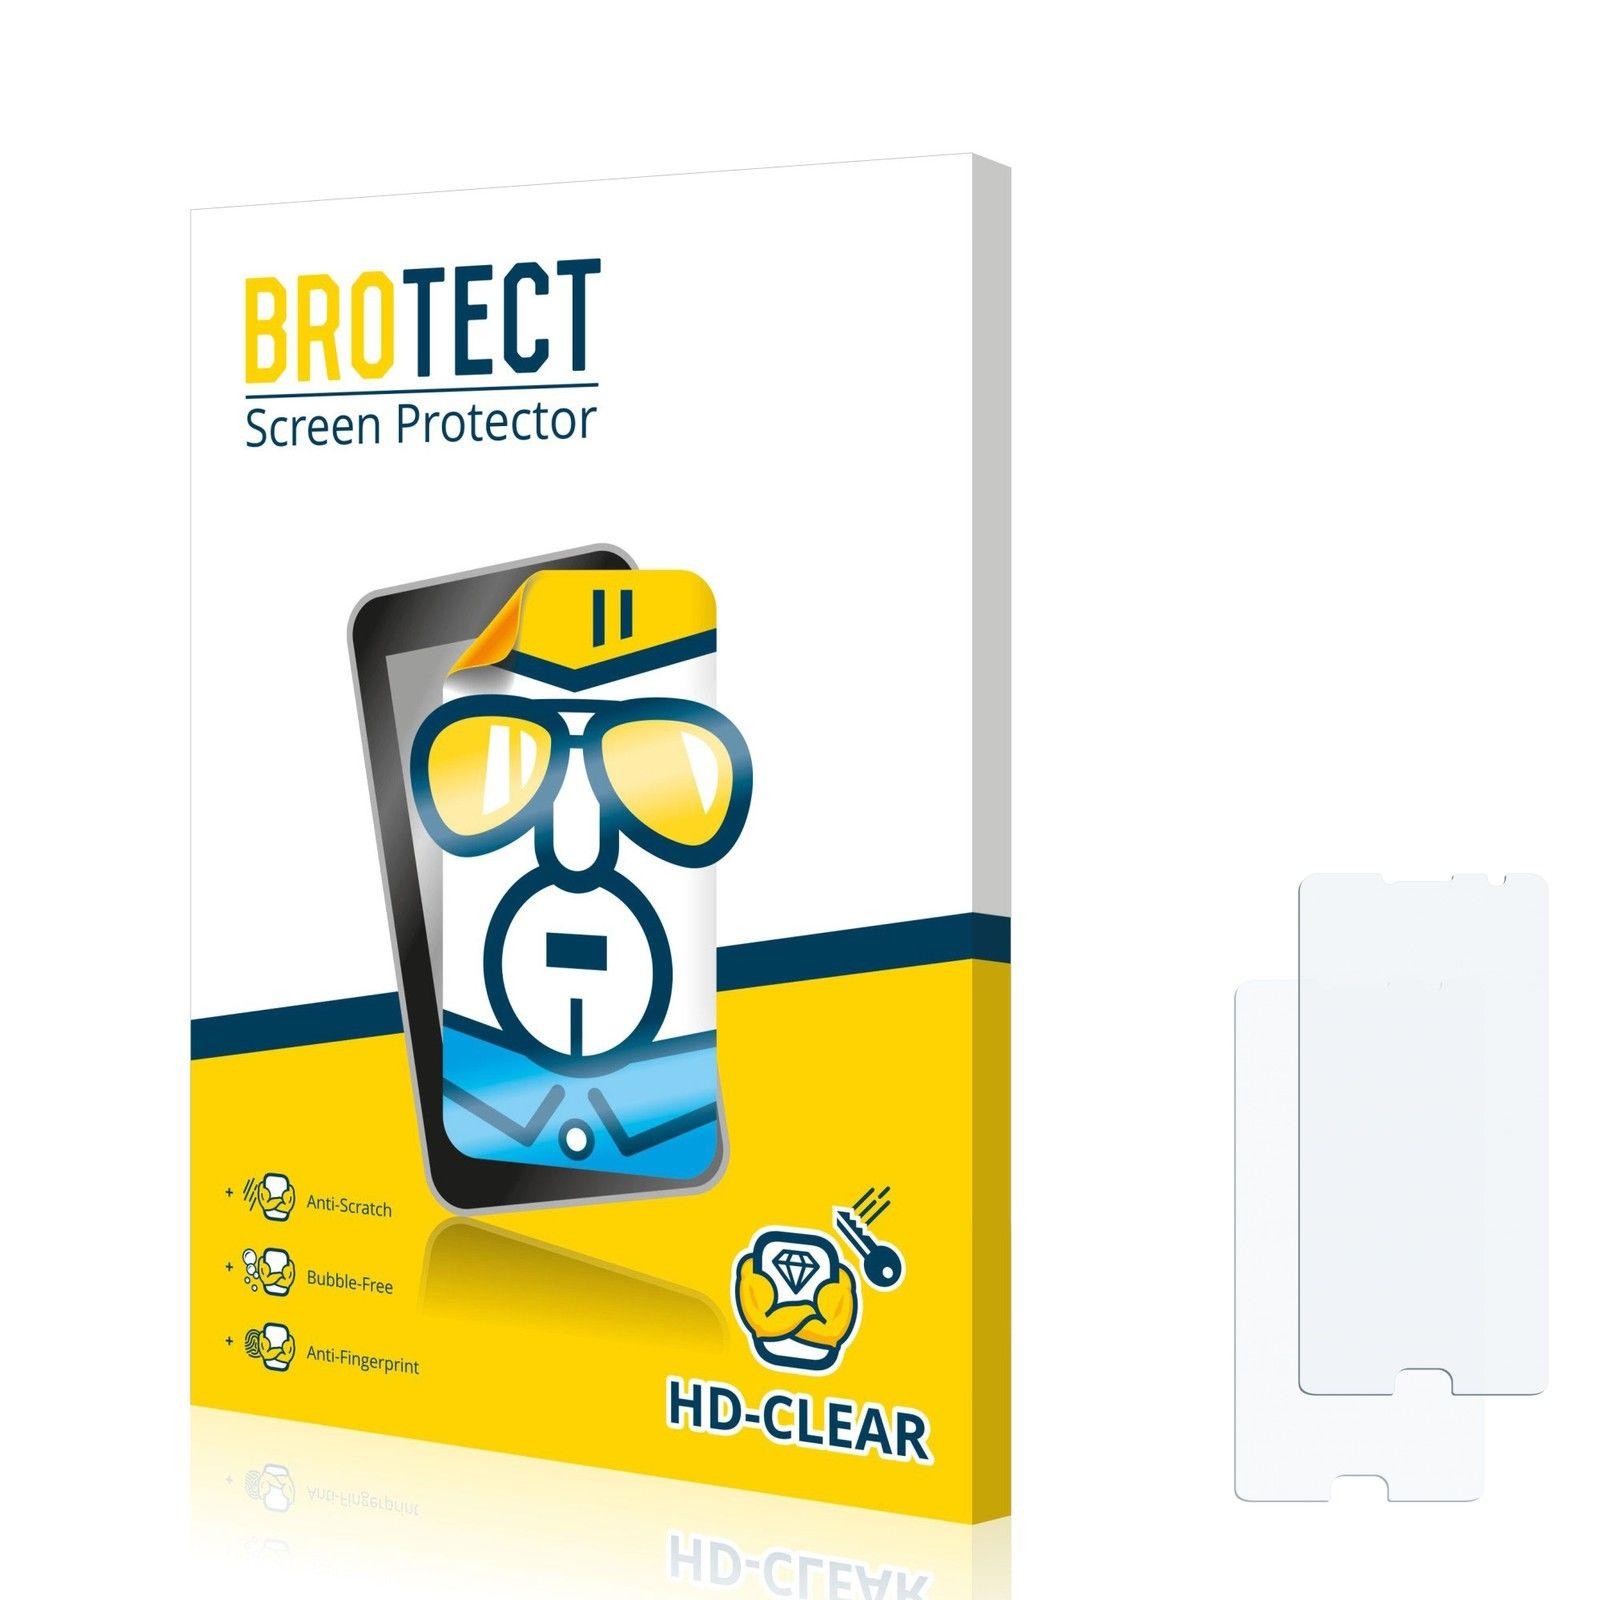 2 ks Ochranná fólie Brotec HD na LCD pro Vodafone Smart Ultra 7